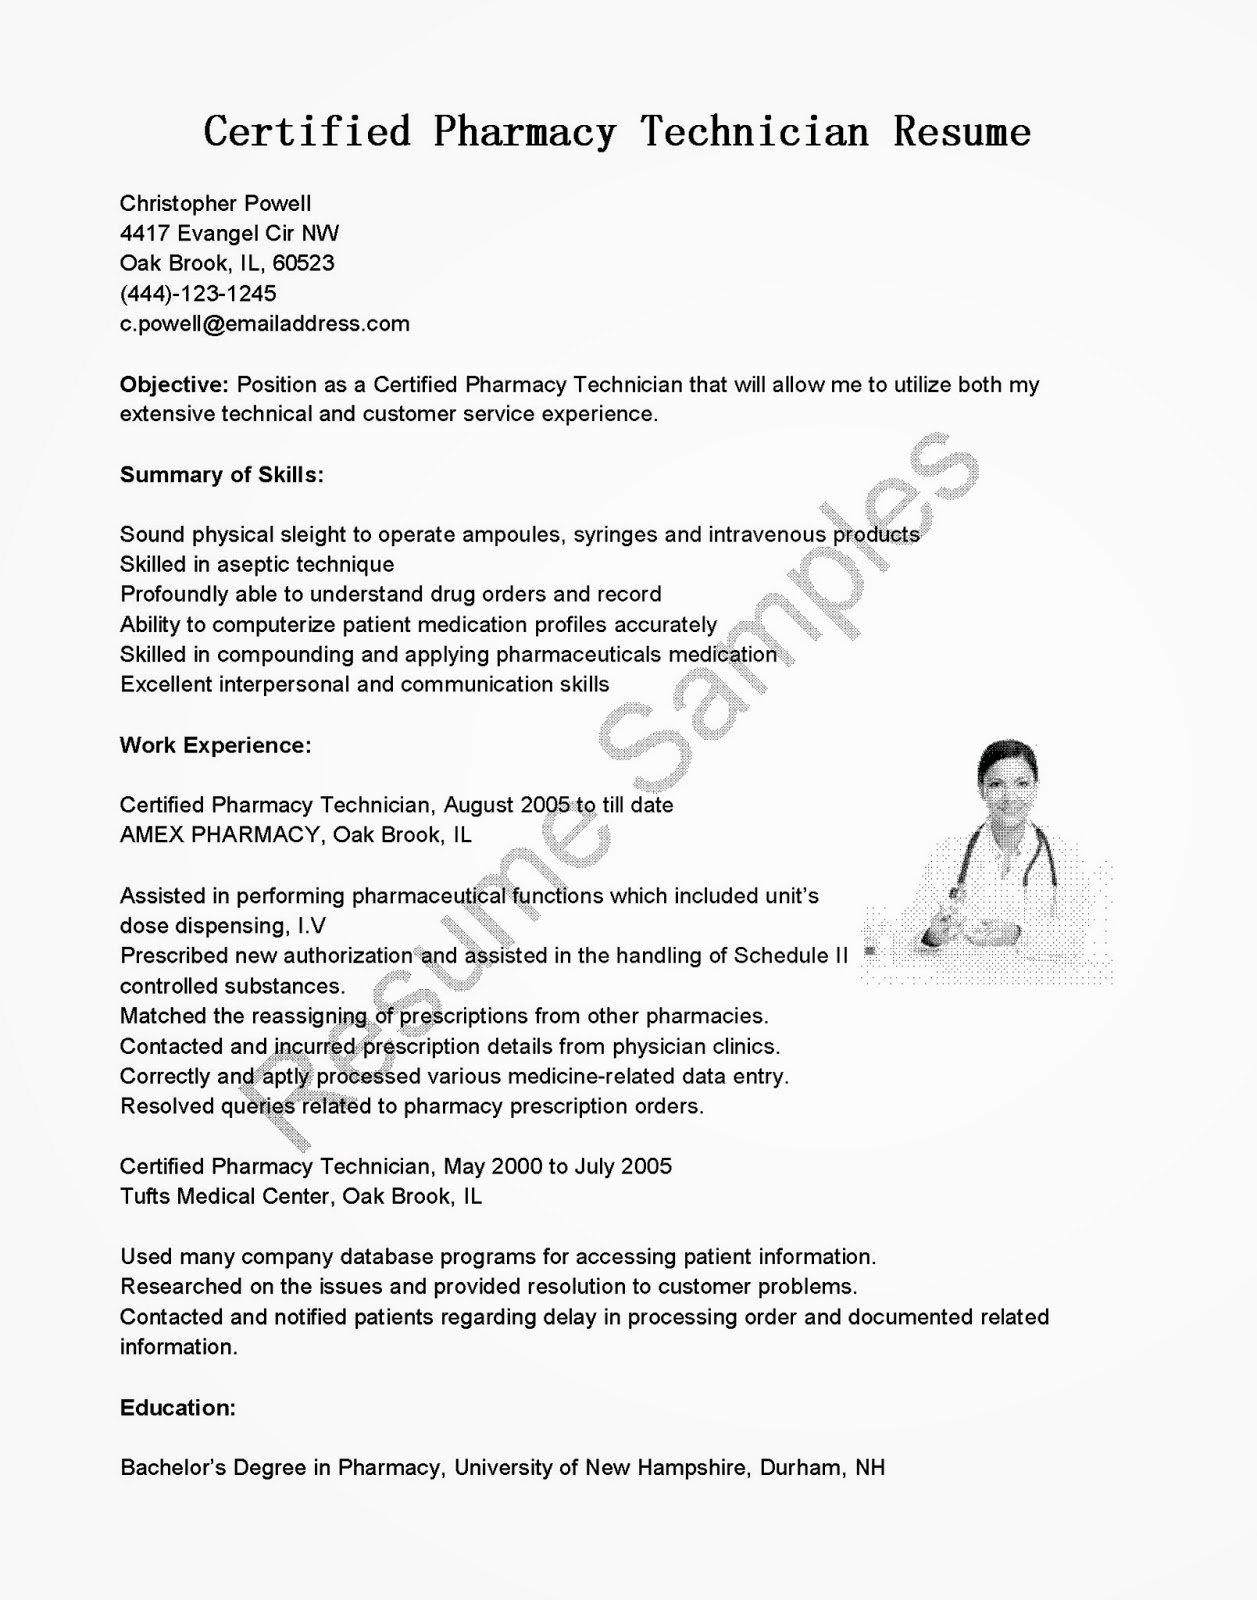 Resume Samples Certified Pharmacy Technician Resume Sample